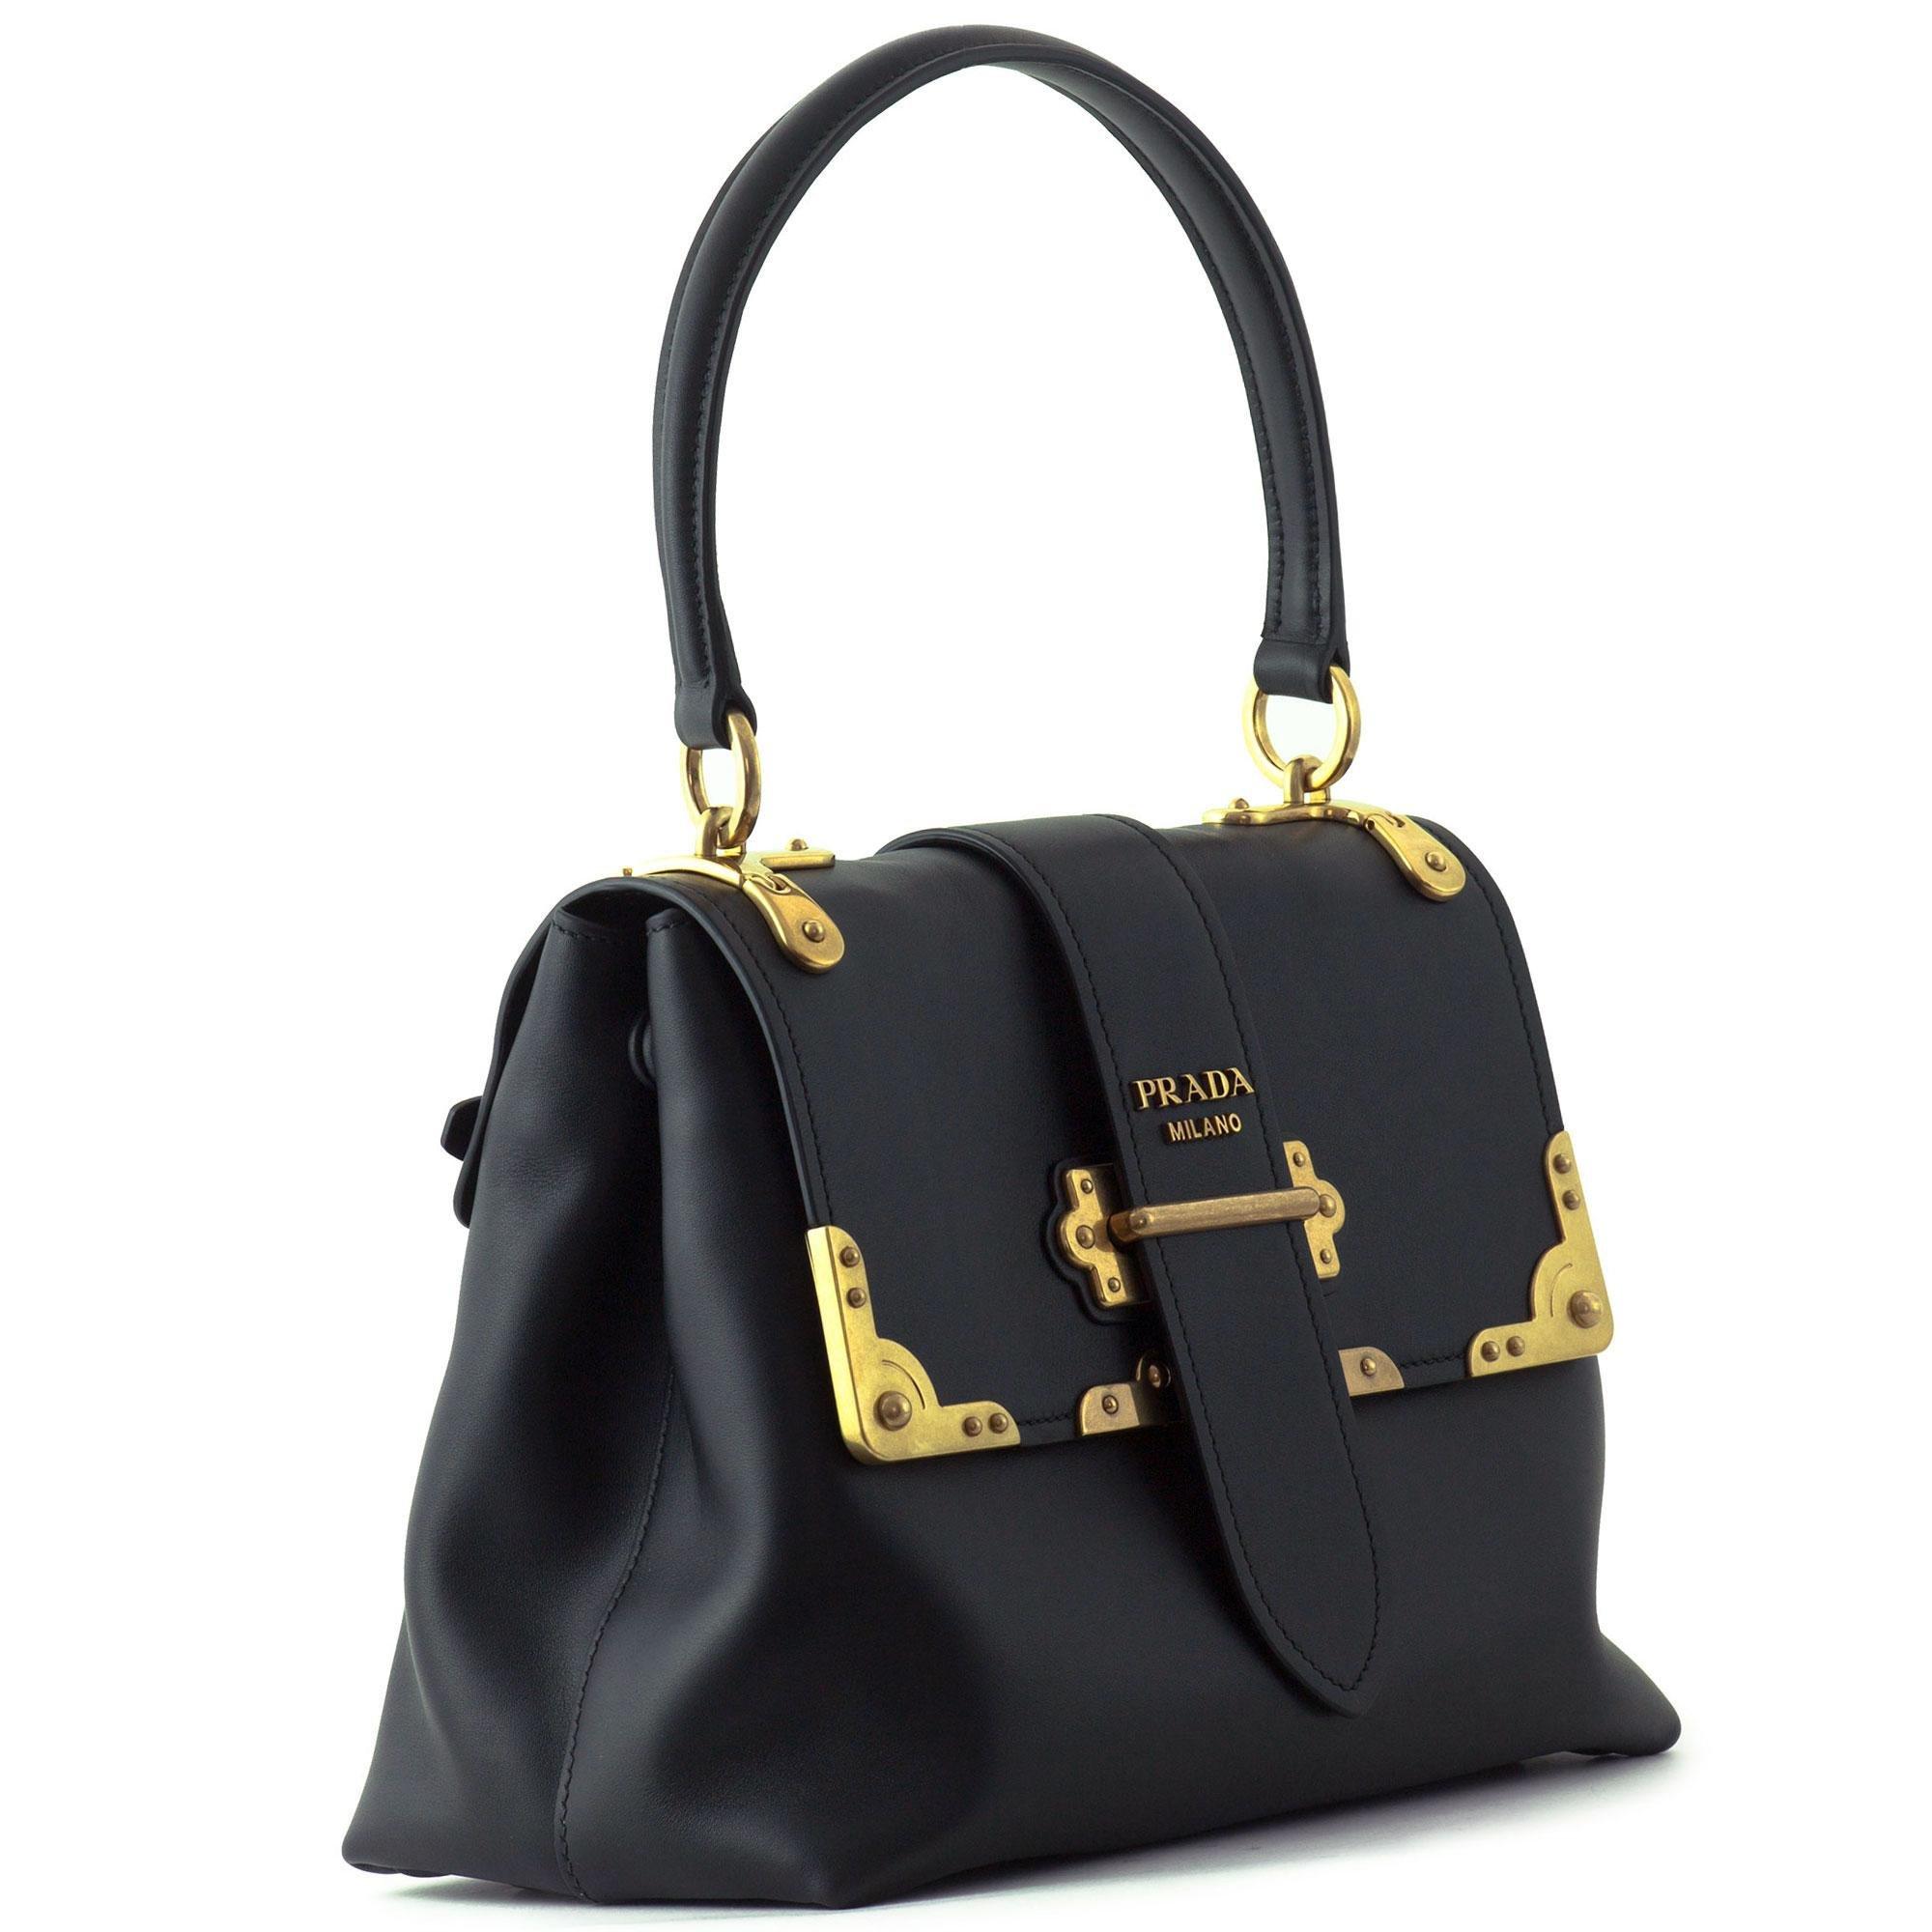 Handbag Lyst Black In Leather Prada xCedoB